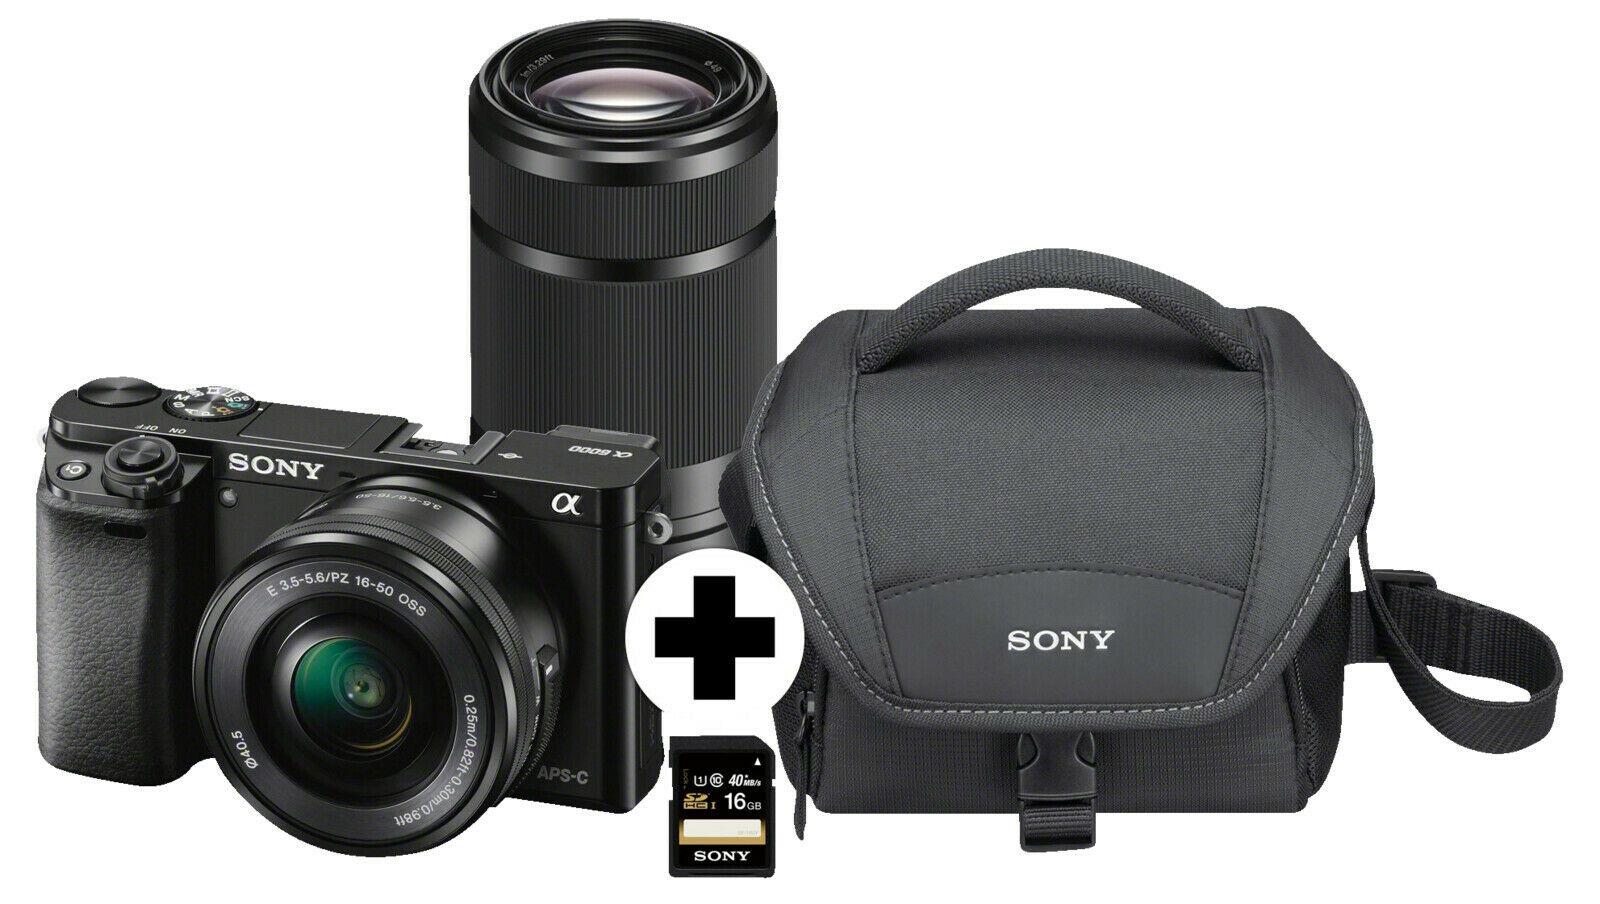 [eBay/MM] SONY Alpha 6000 ZOOM+TELEZOOM KIT, 16-50mm & 55-210mm